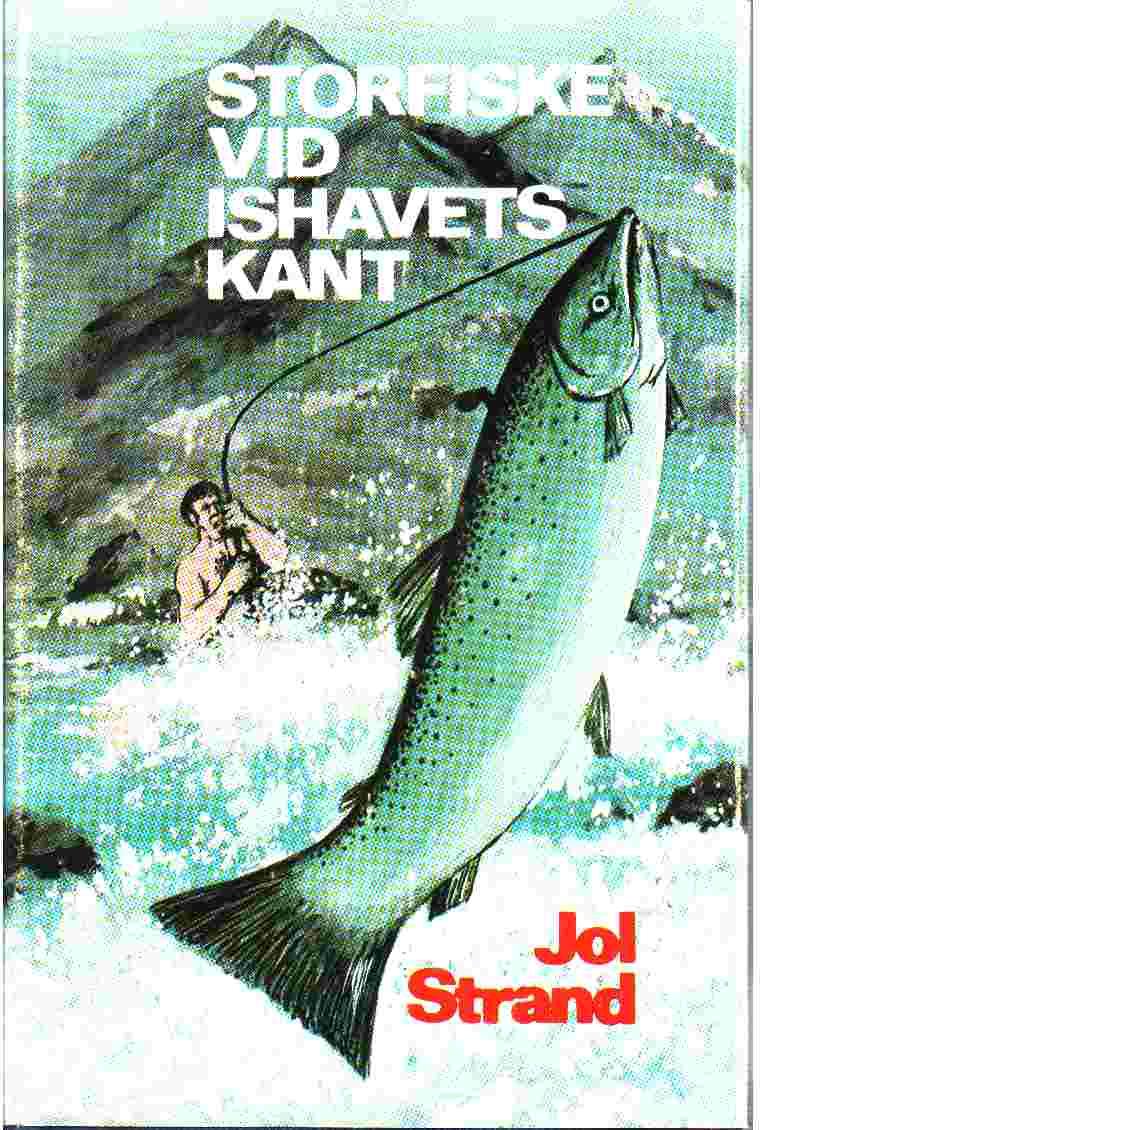 Storfiske vid Ishavets kant - Strand, Jol